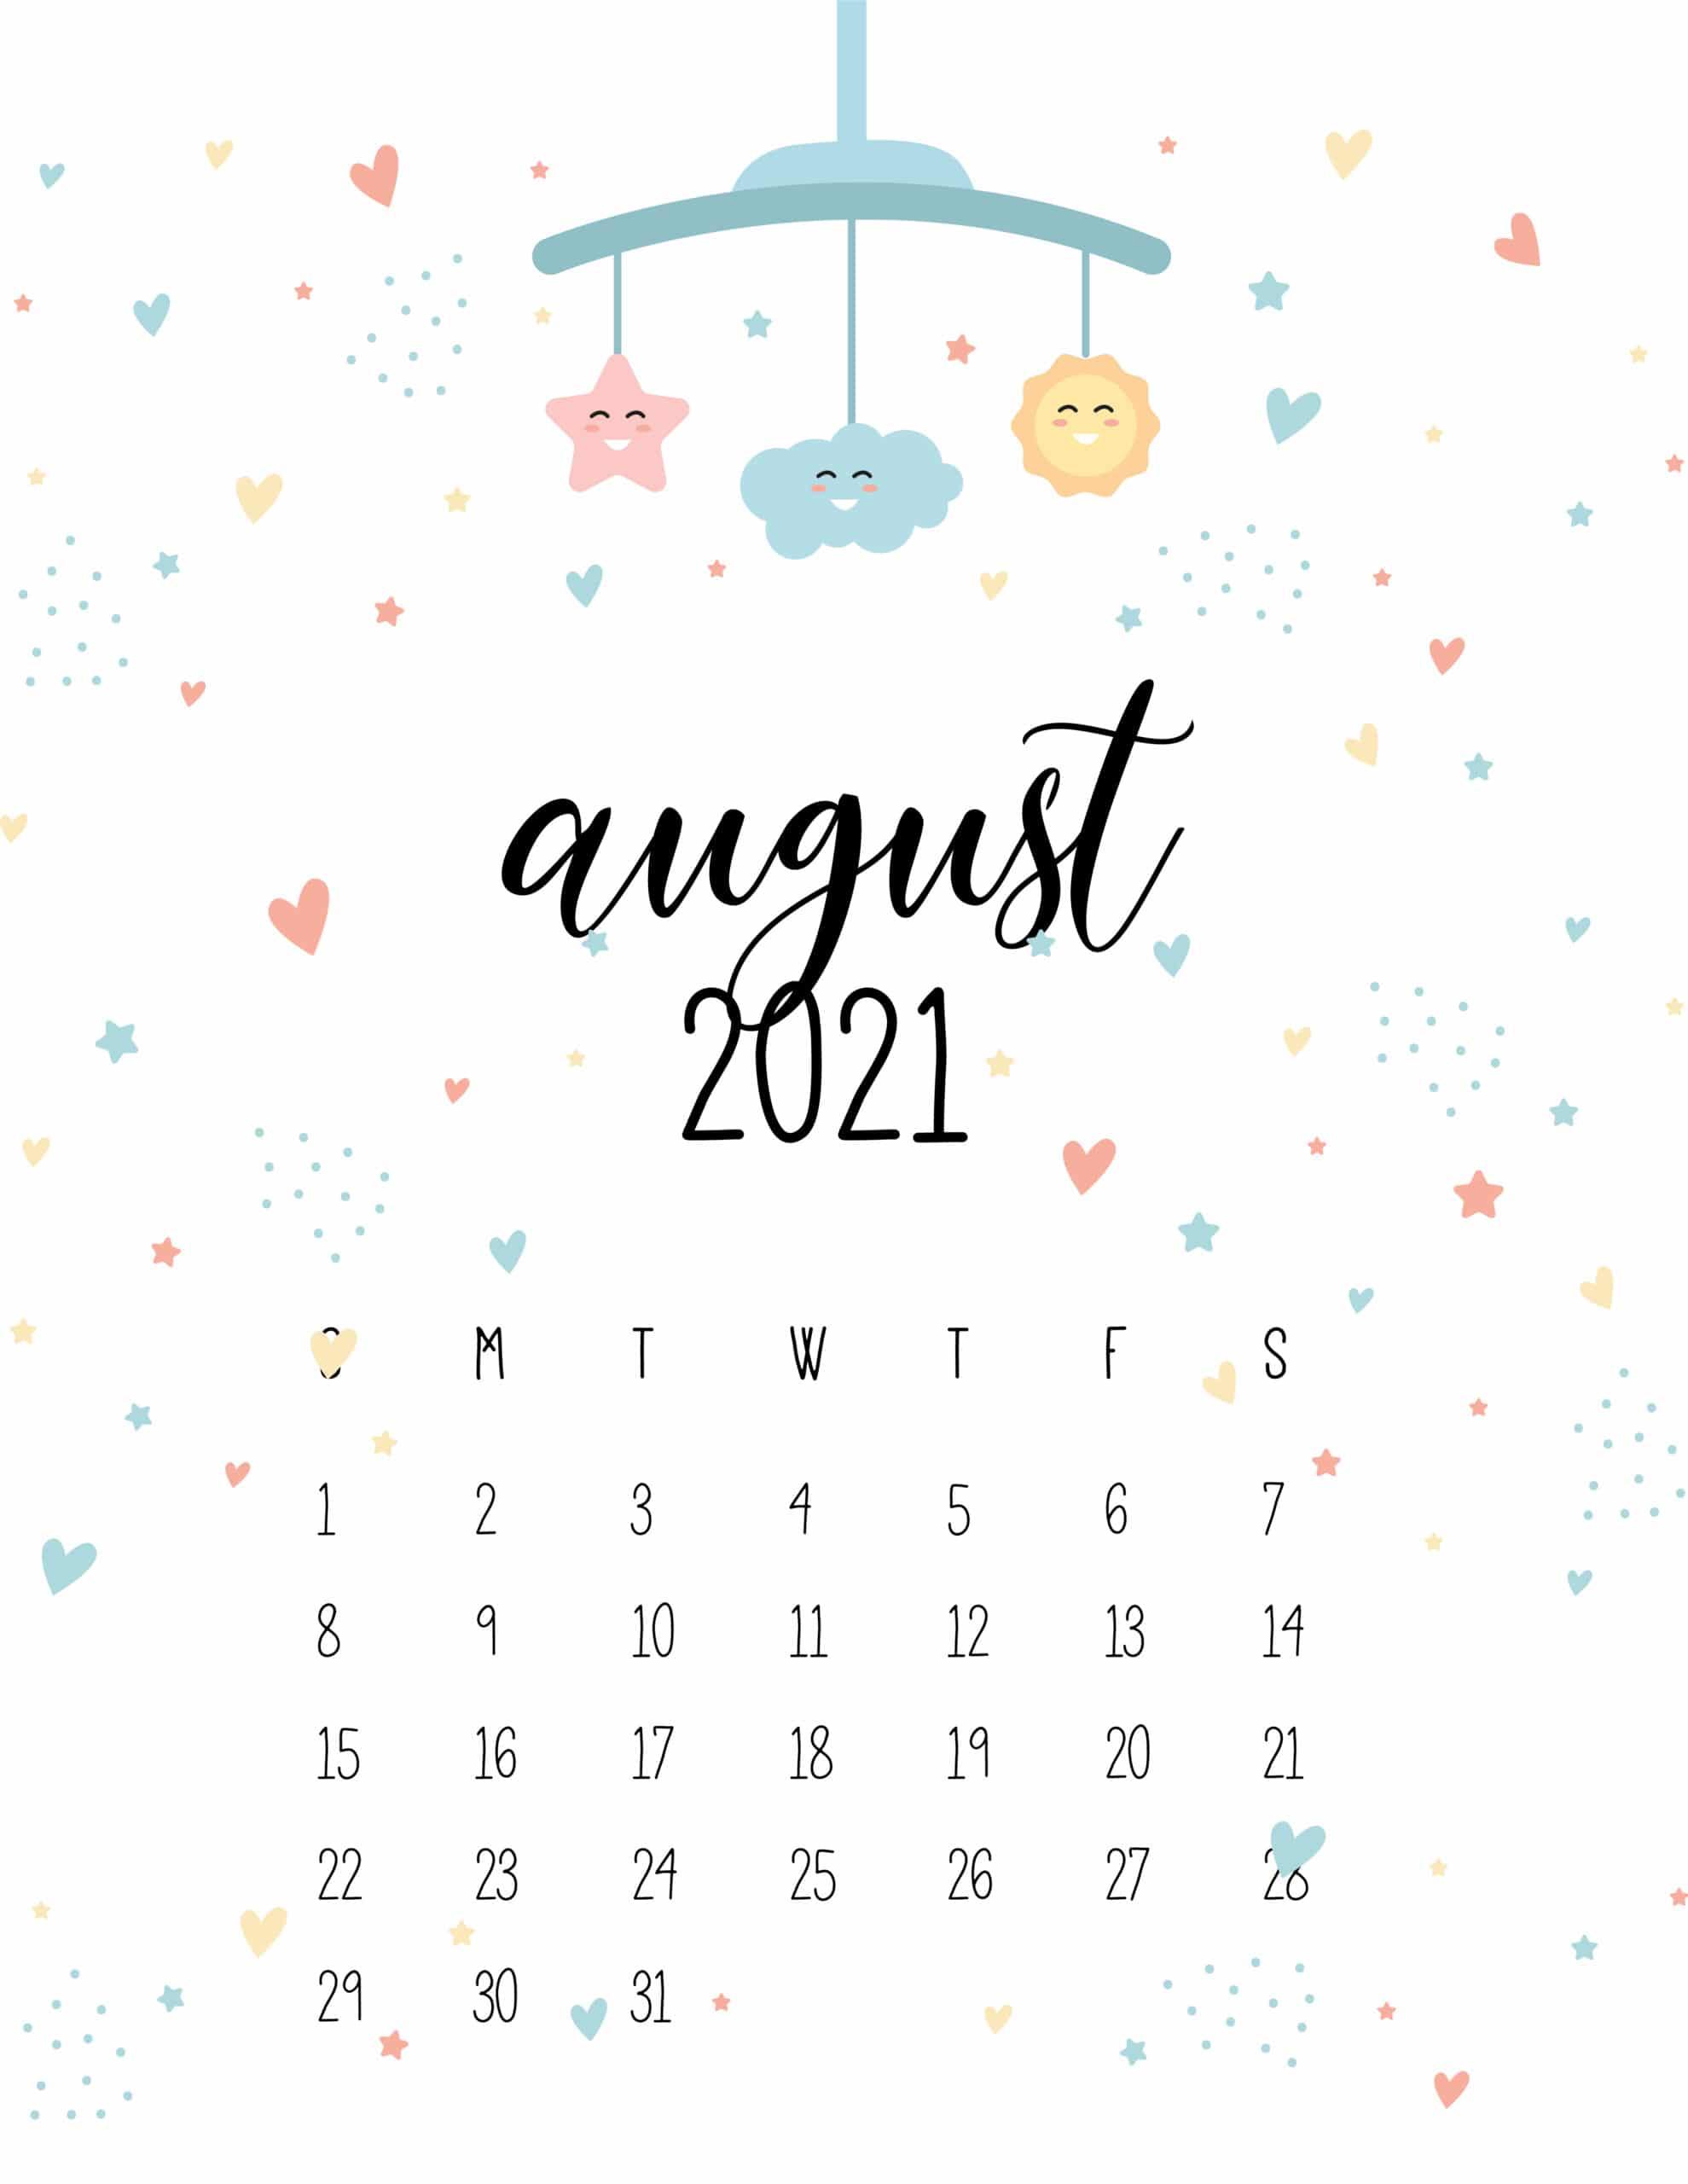 Cute Nursery Mobile Calendar 2021 - World of Printables